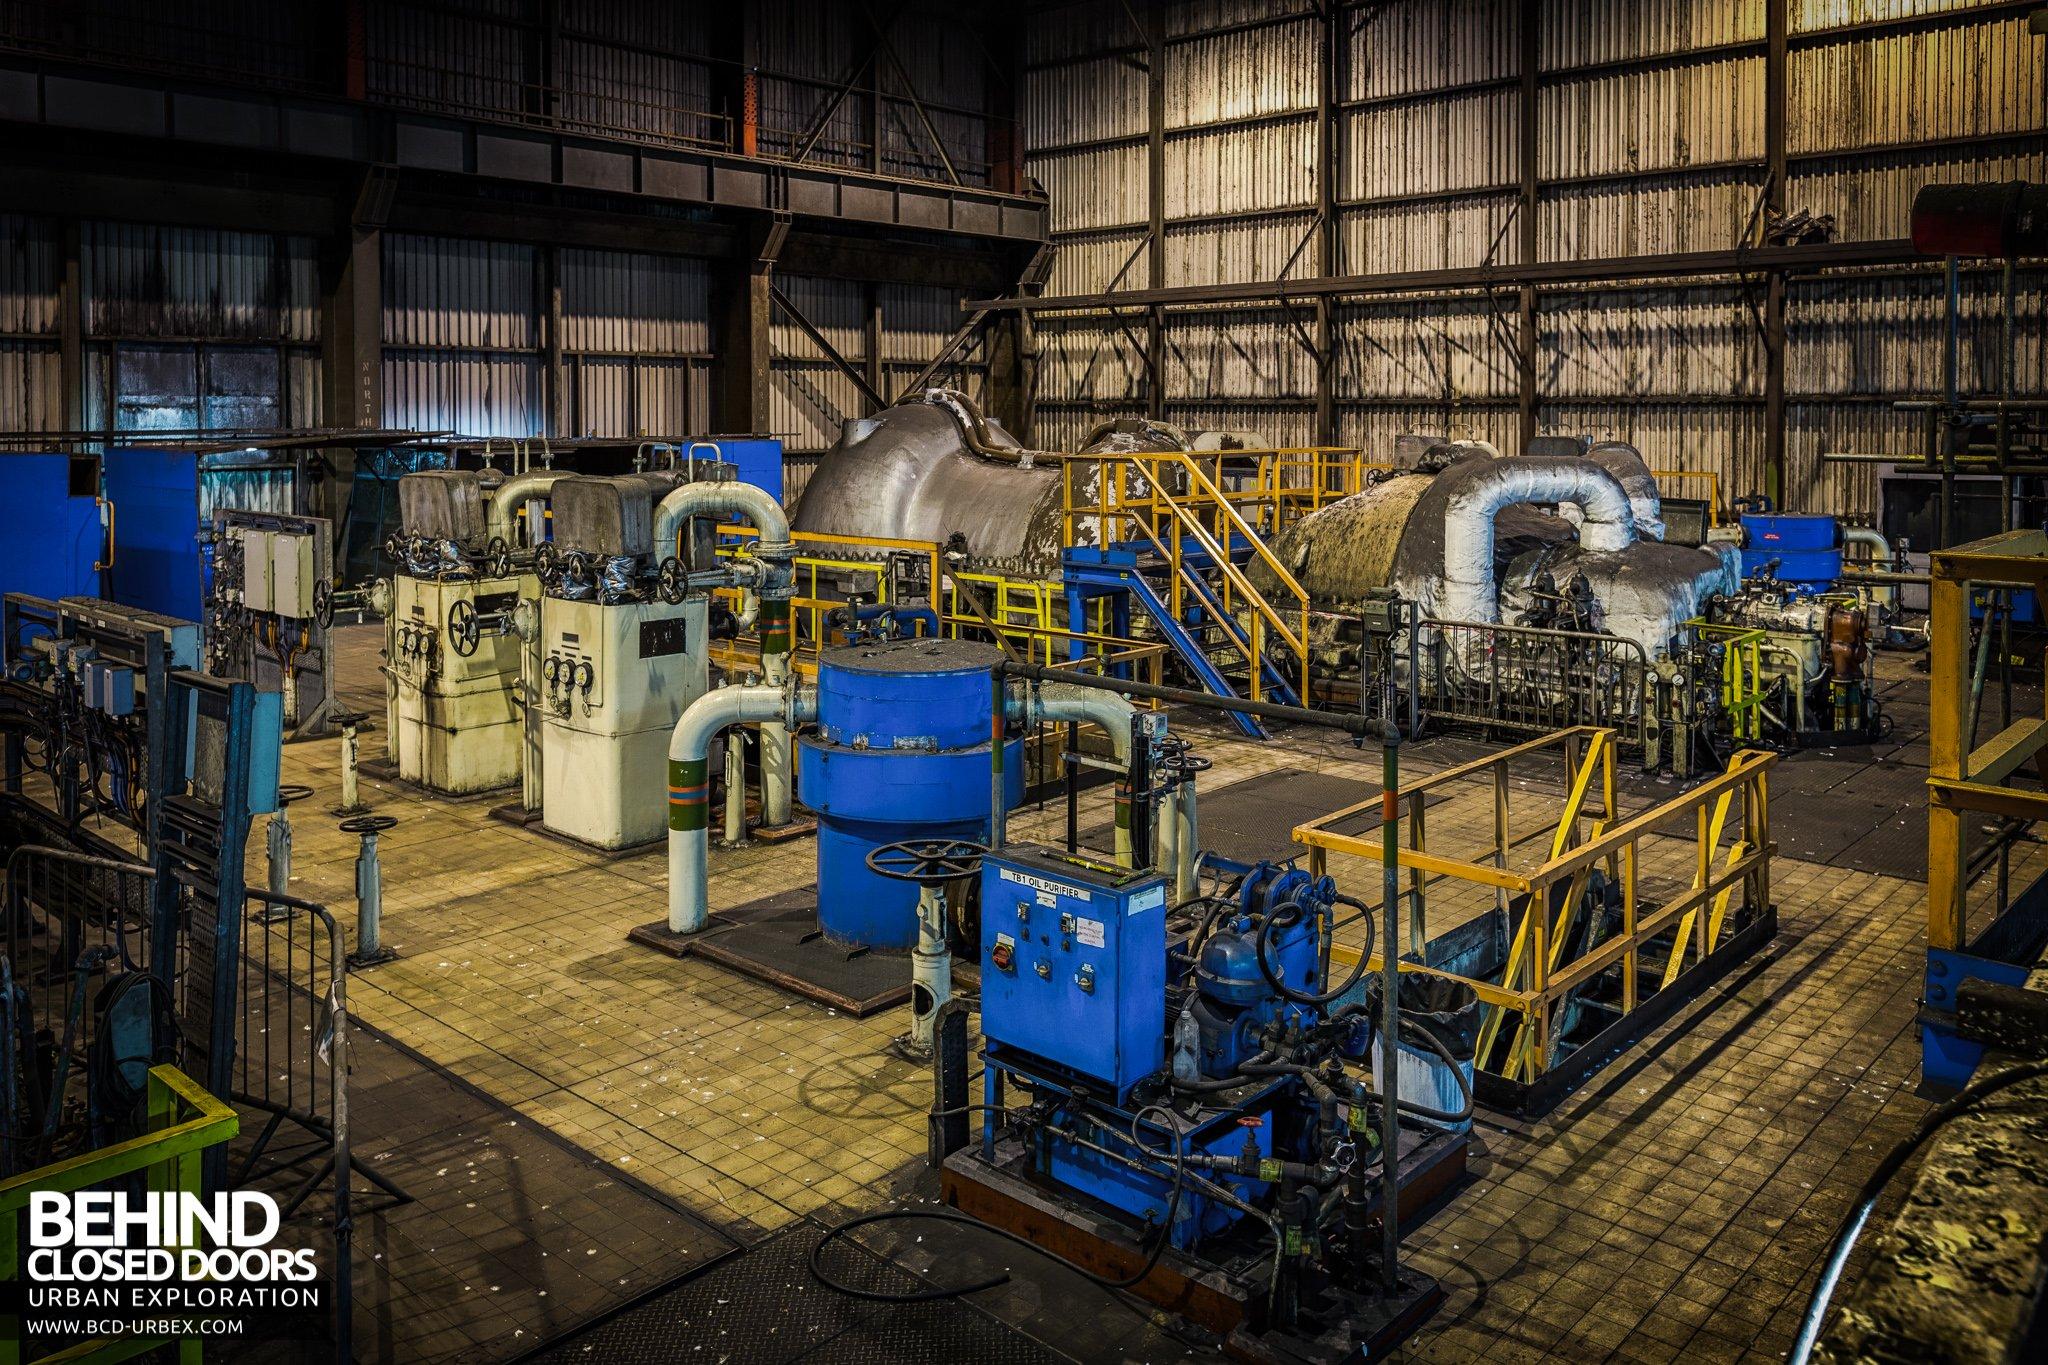 Behind Closed Doors : Redcar steelworks power station teesside uk urbex